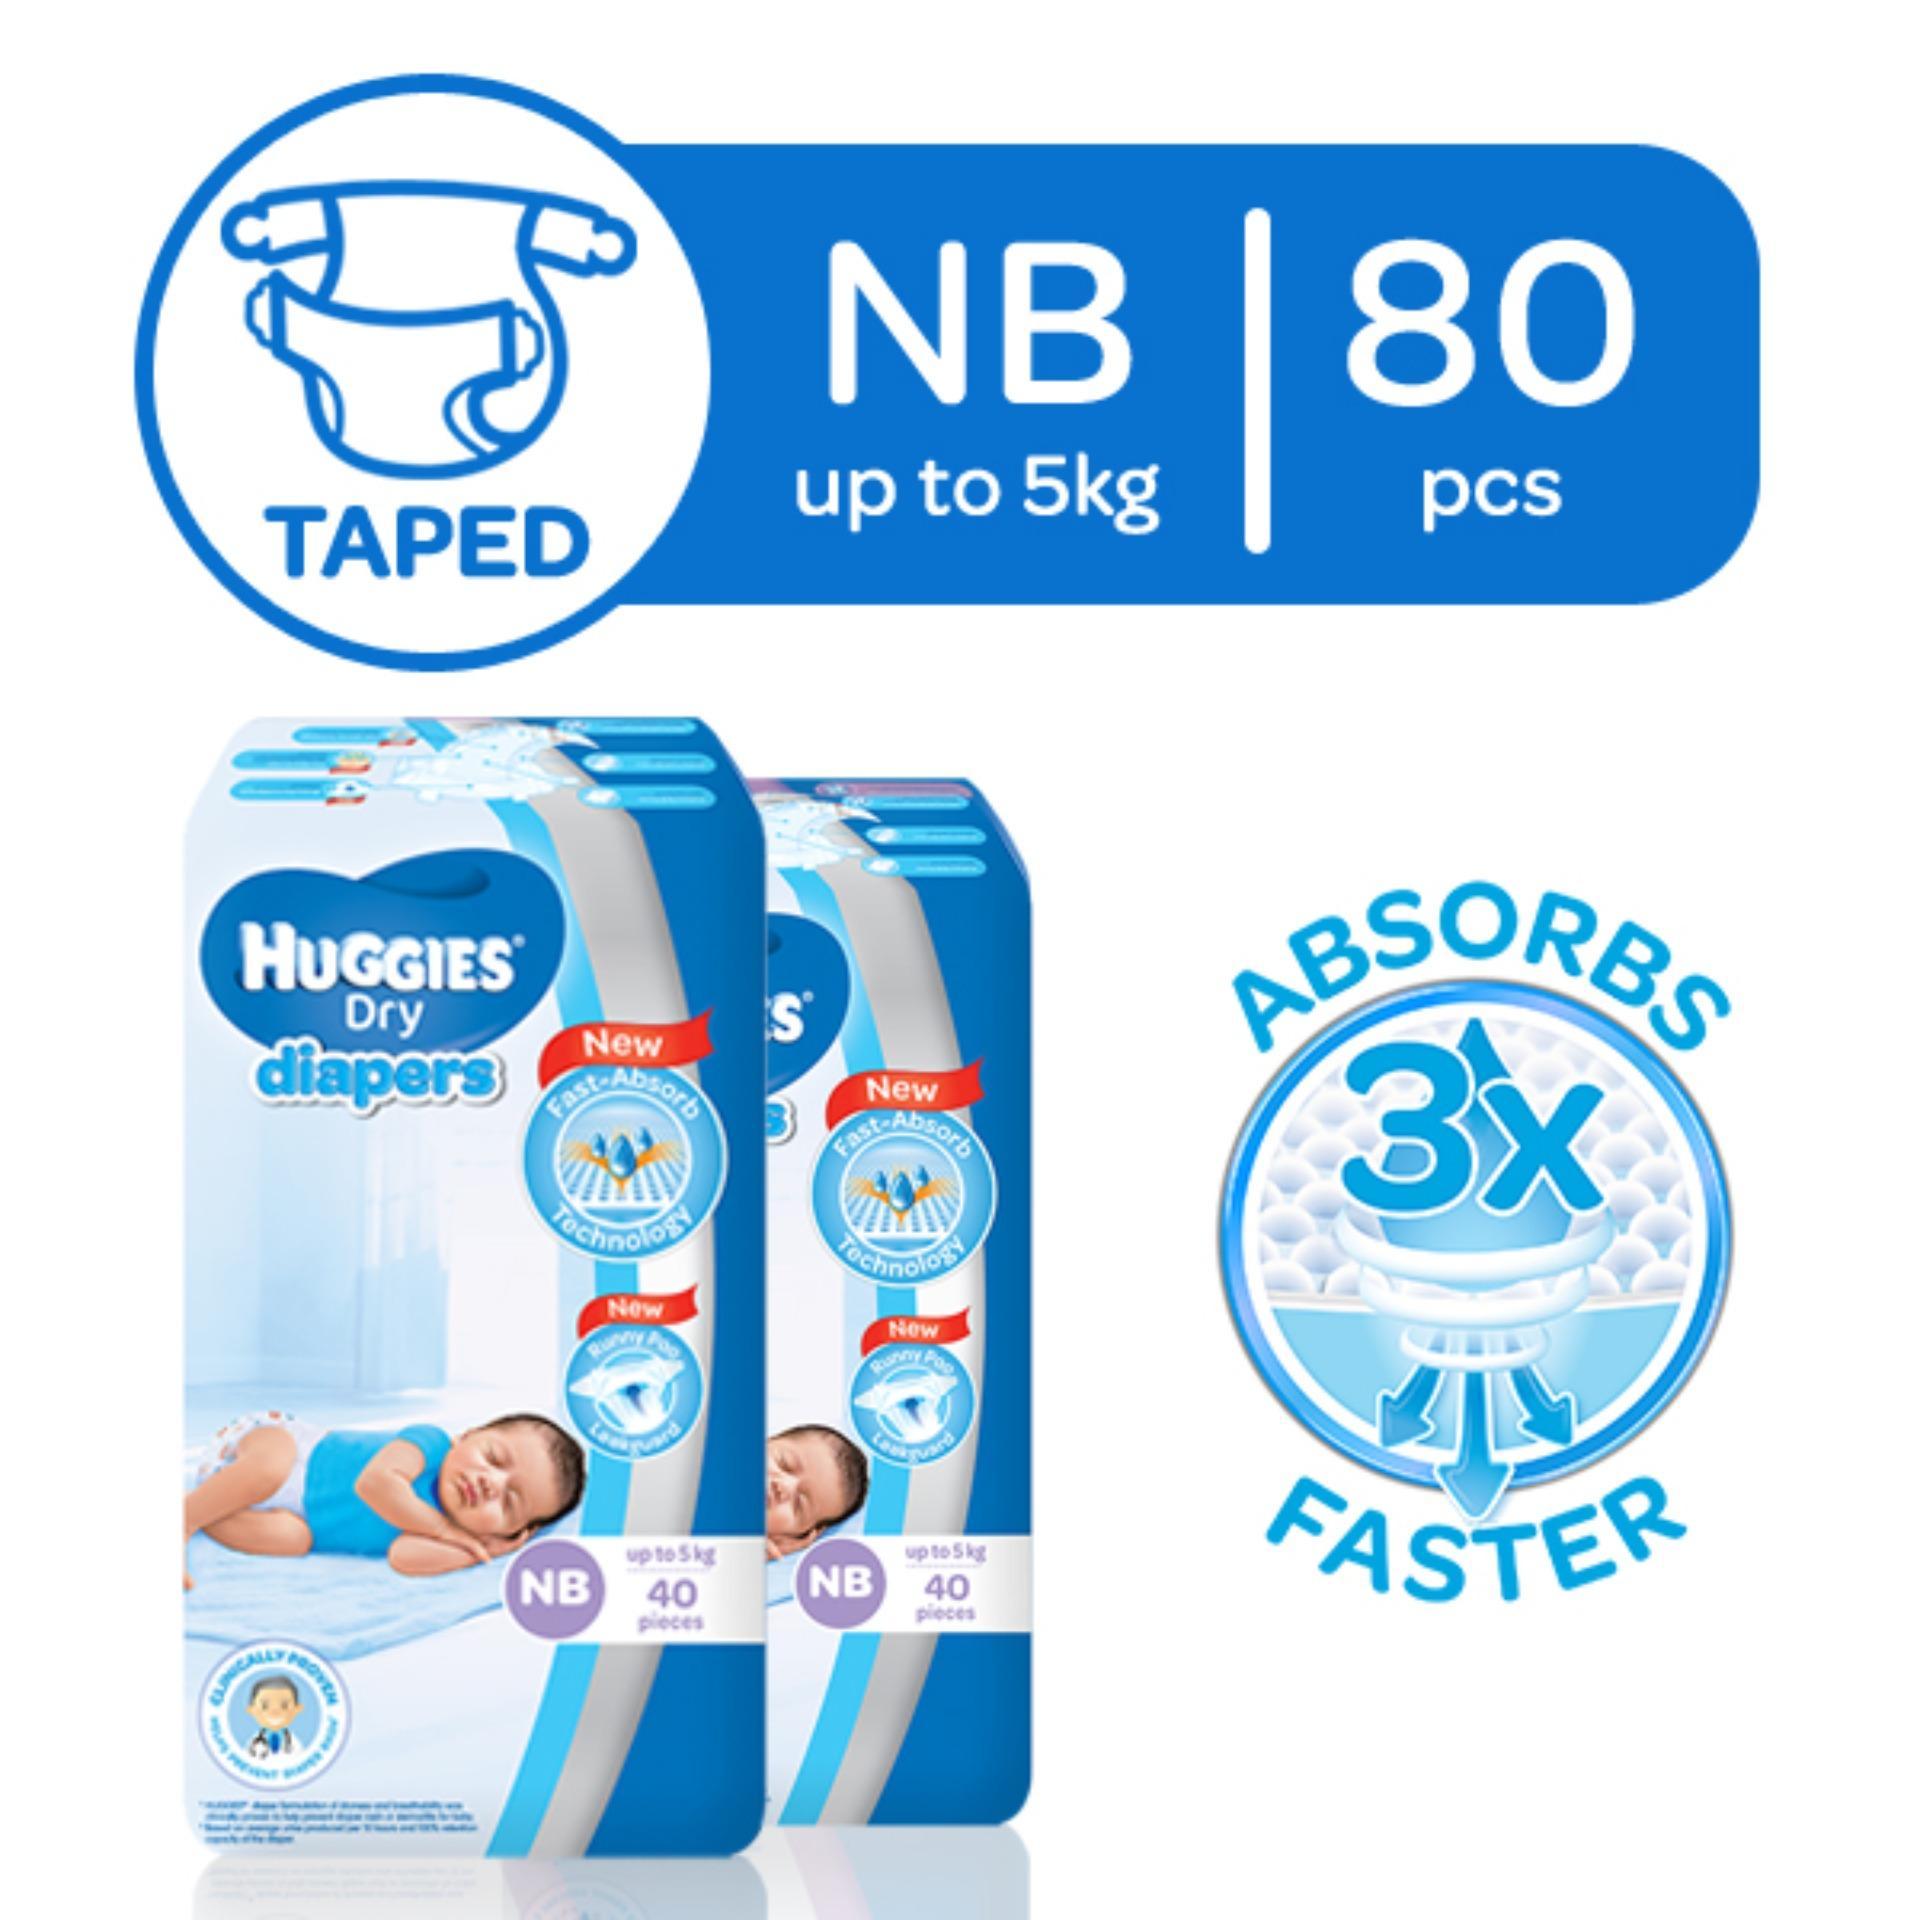 a44d53d98ac Huggies Dry Newborn - 40 pcs x 2 packs (80 pcs) - Tape Diapers